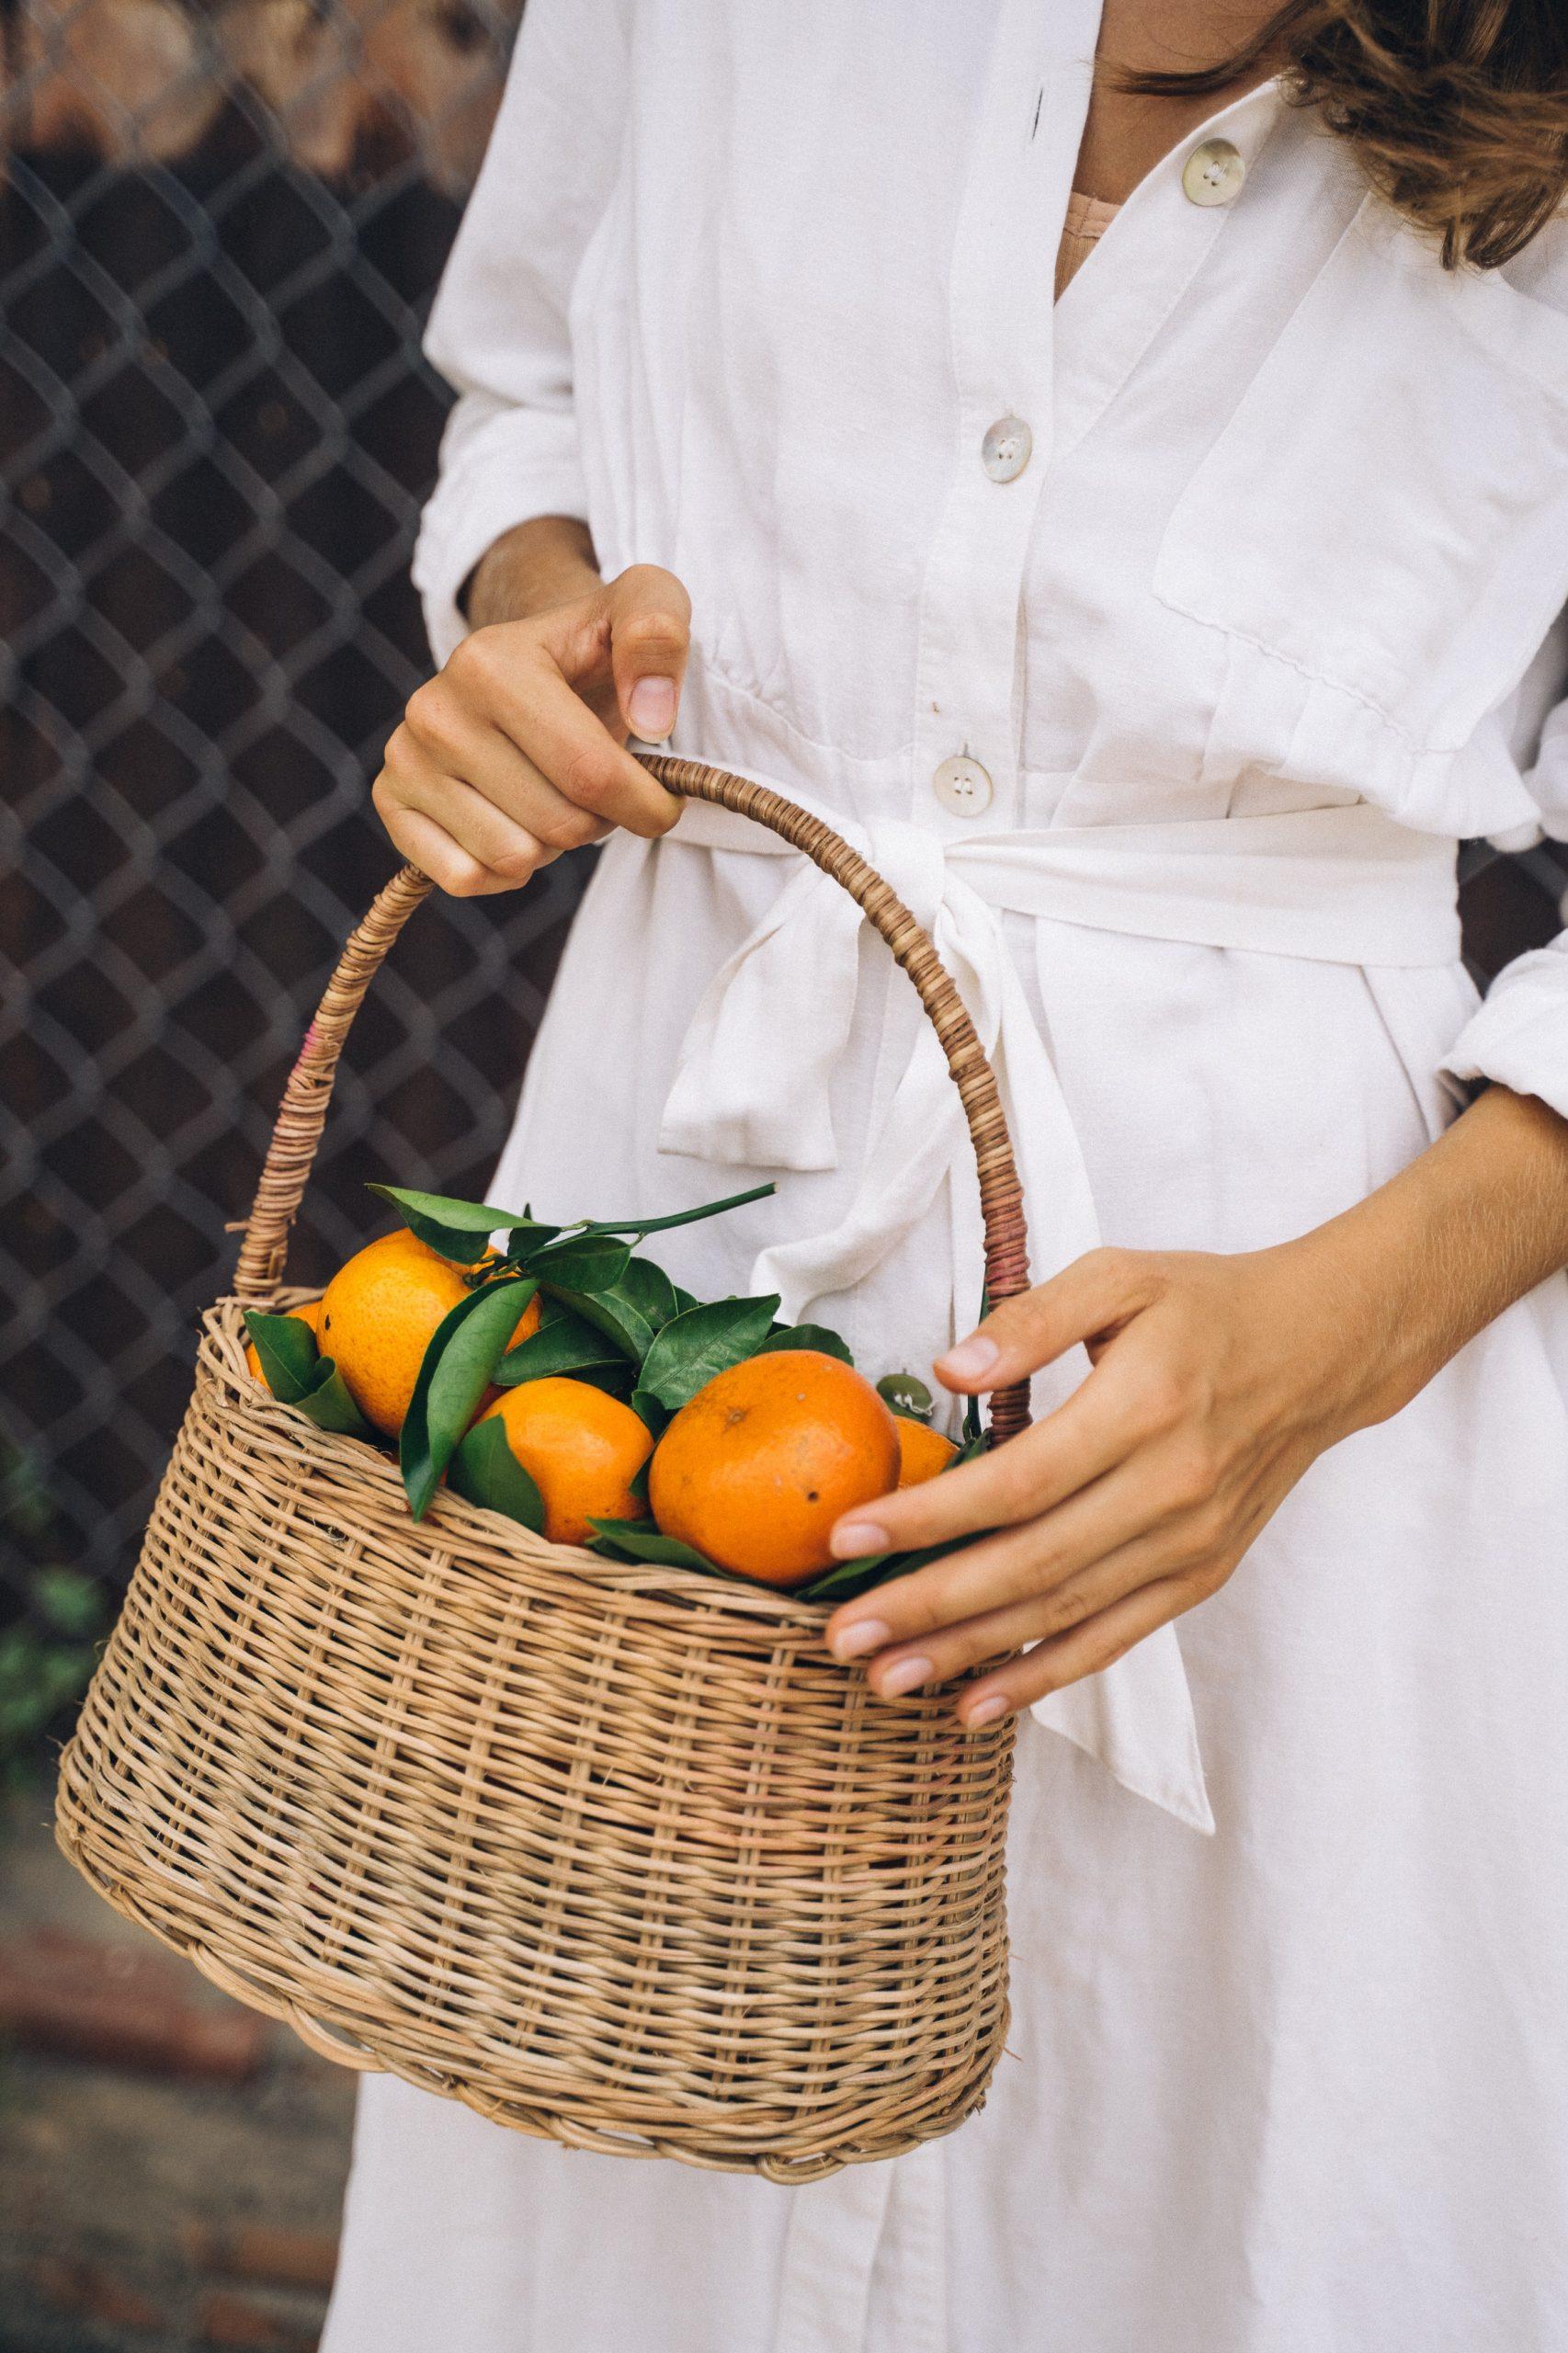 White flowy dress and basket of mandarins